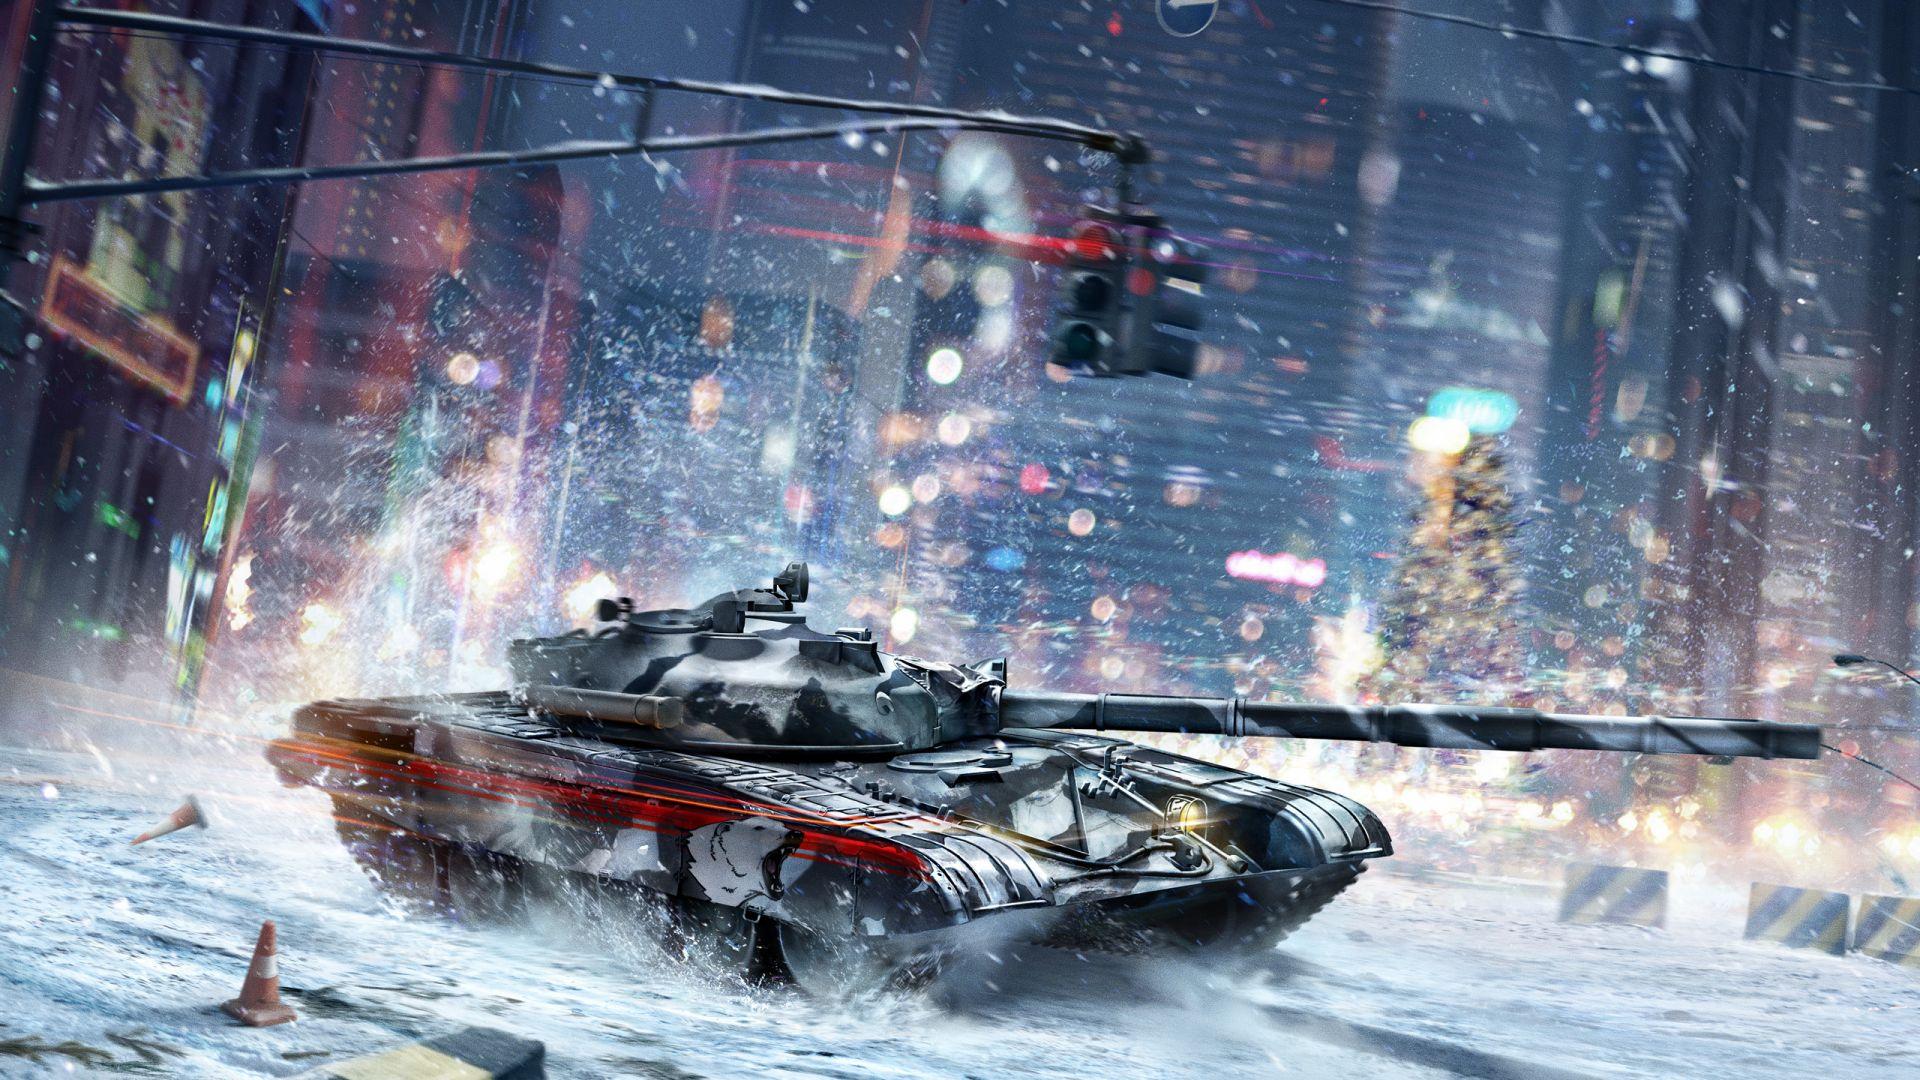 Wallpaper Armored Warfare Online game, winter, tank, battle